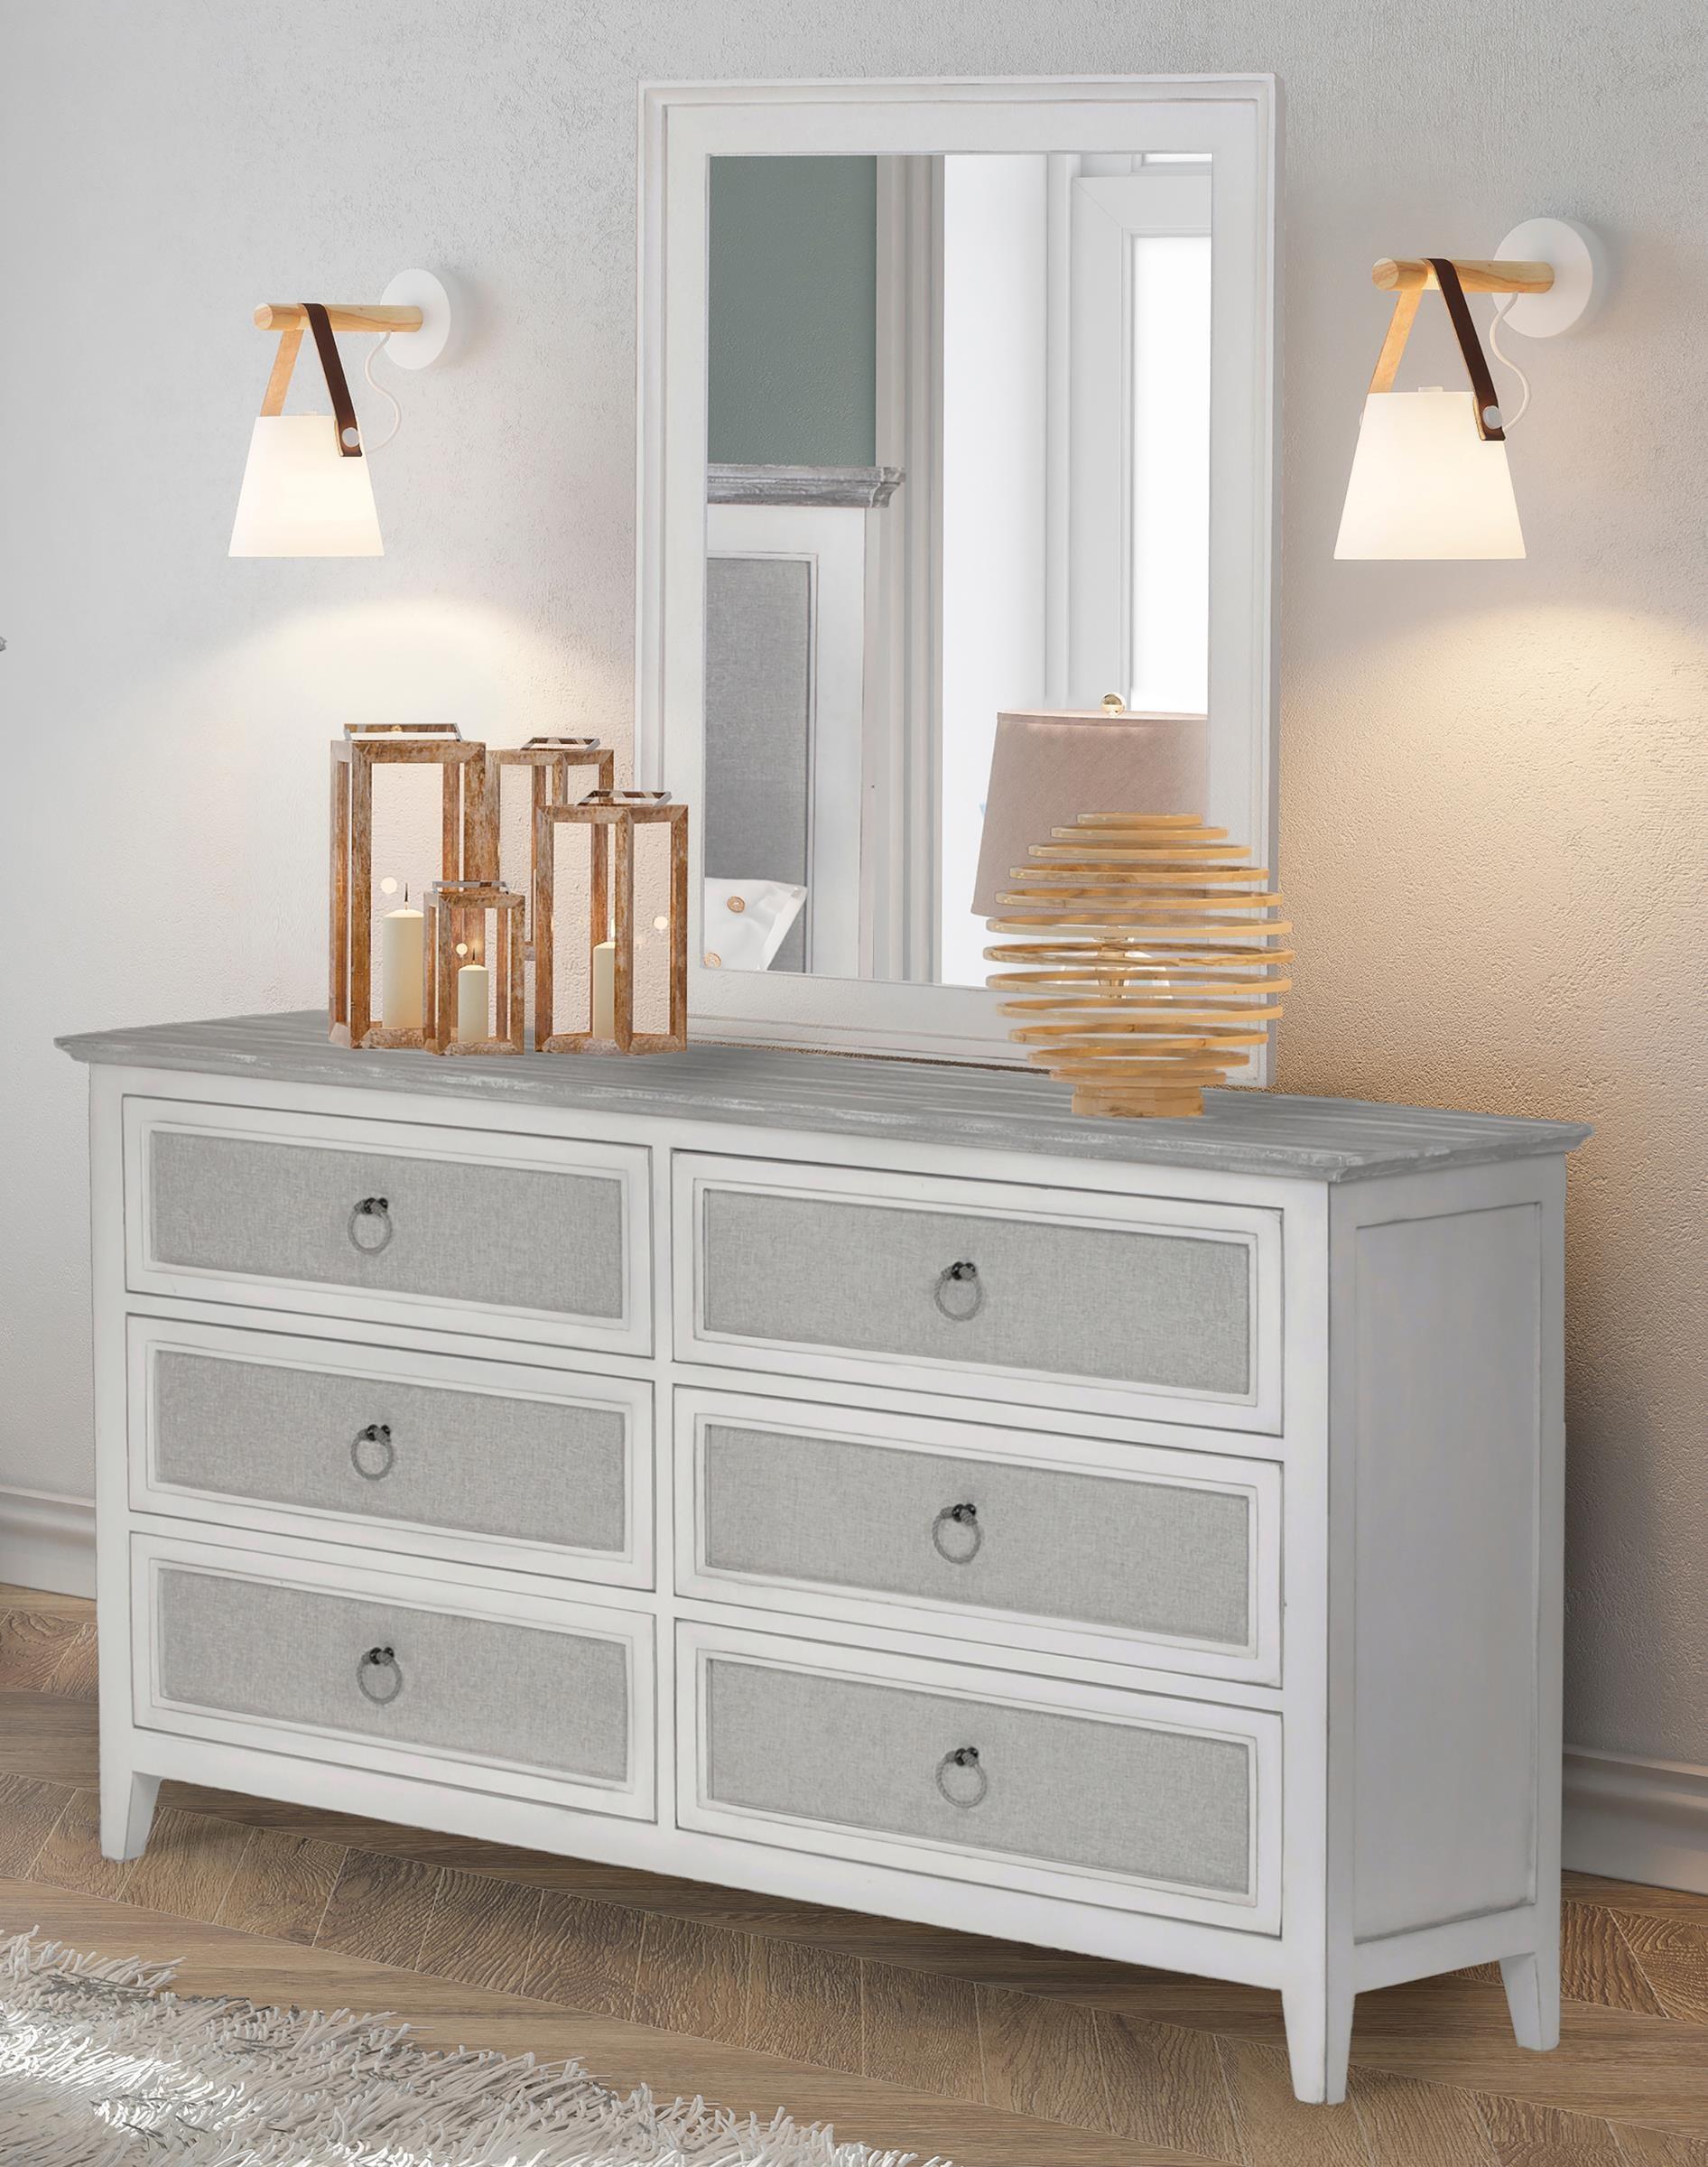 Captiva Island Six drawer dresser and mirror by Sea Winds Trading Company at Johnny Janosik